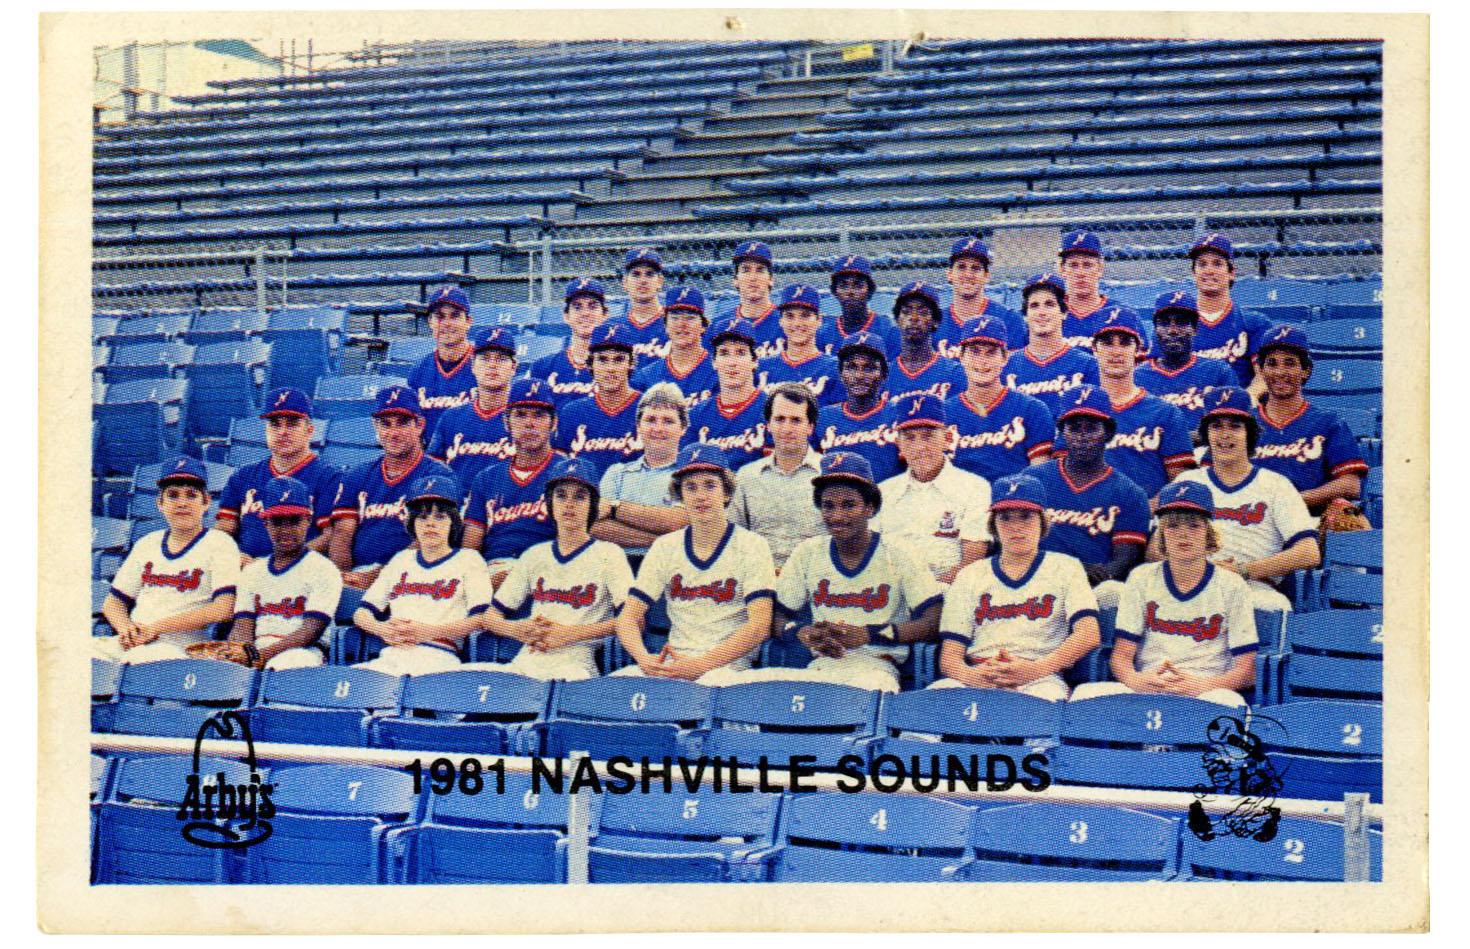 Nashville Sounds Team Photo 1981